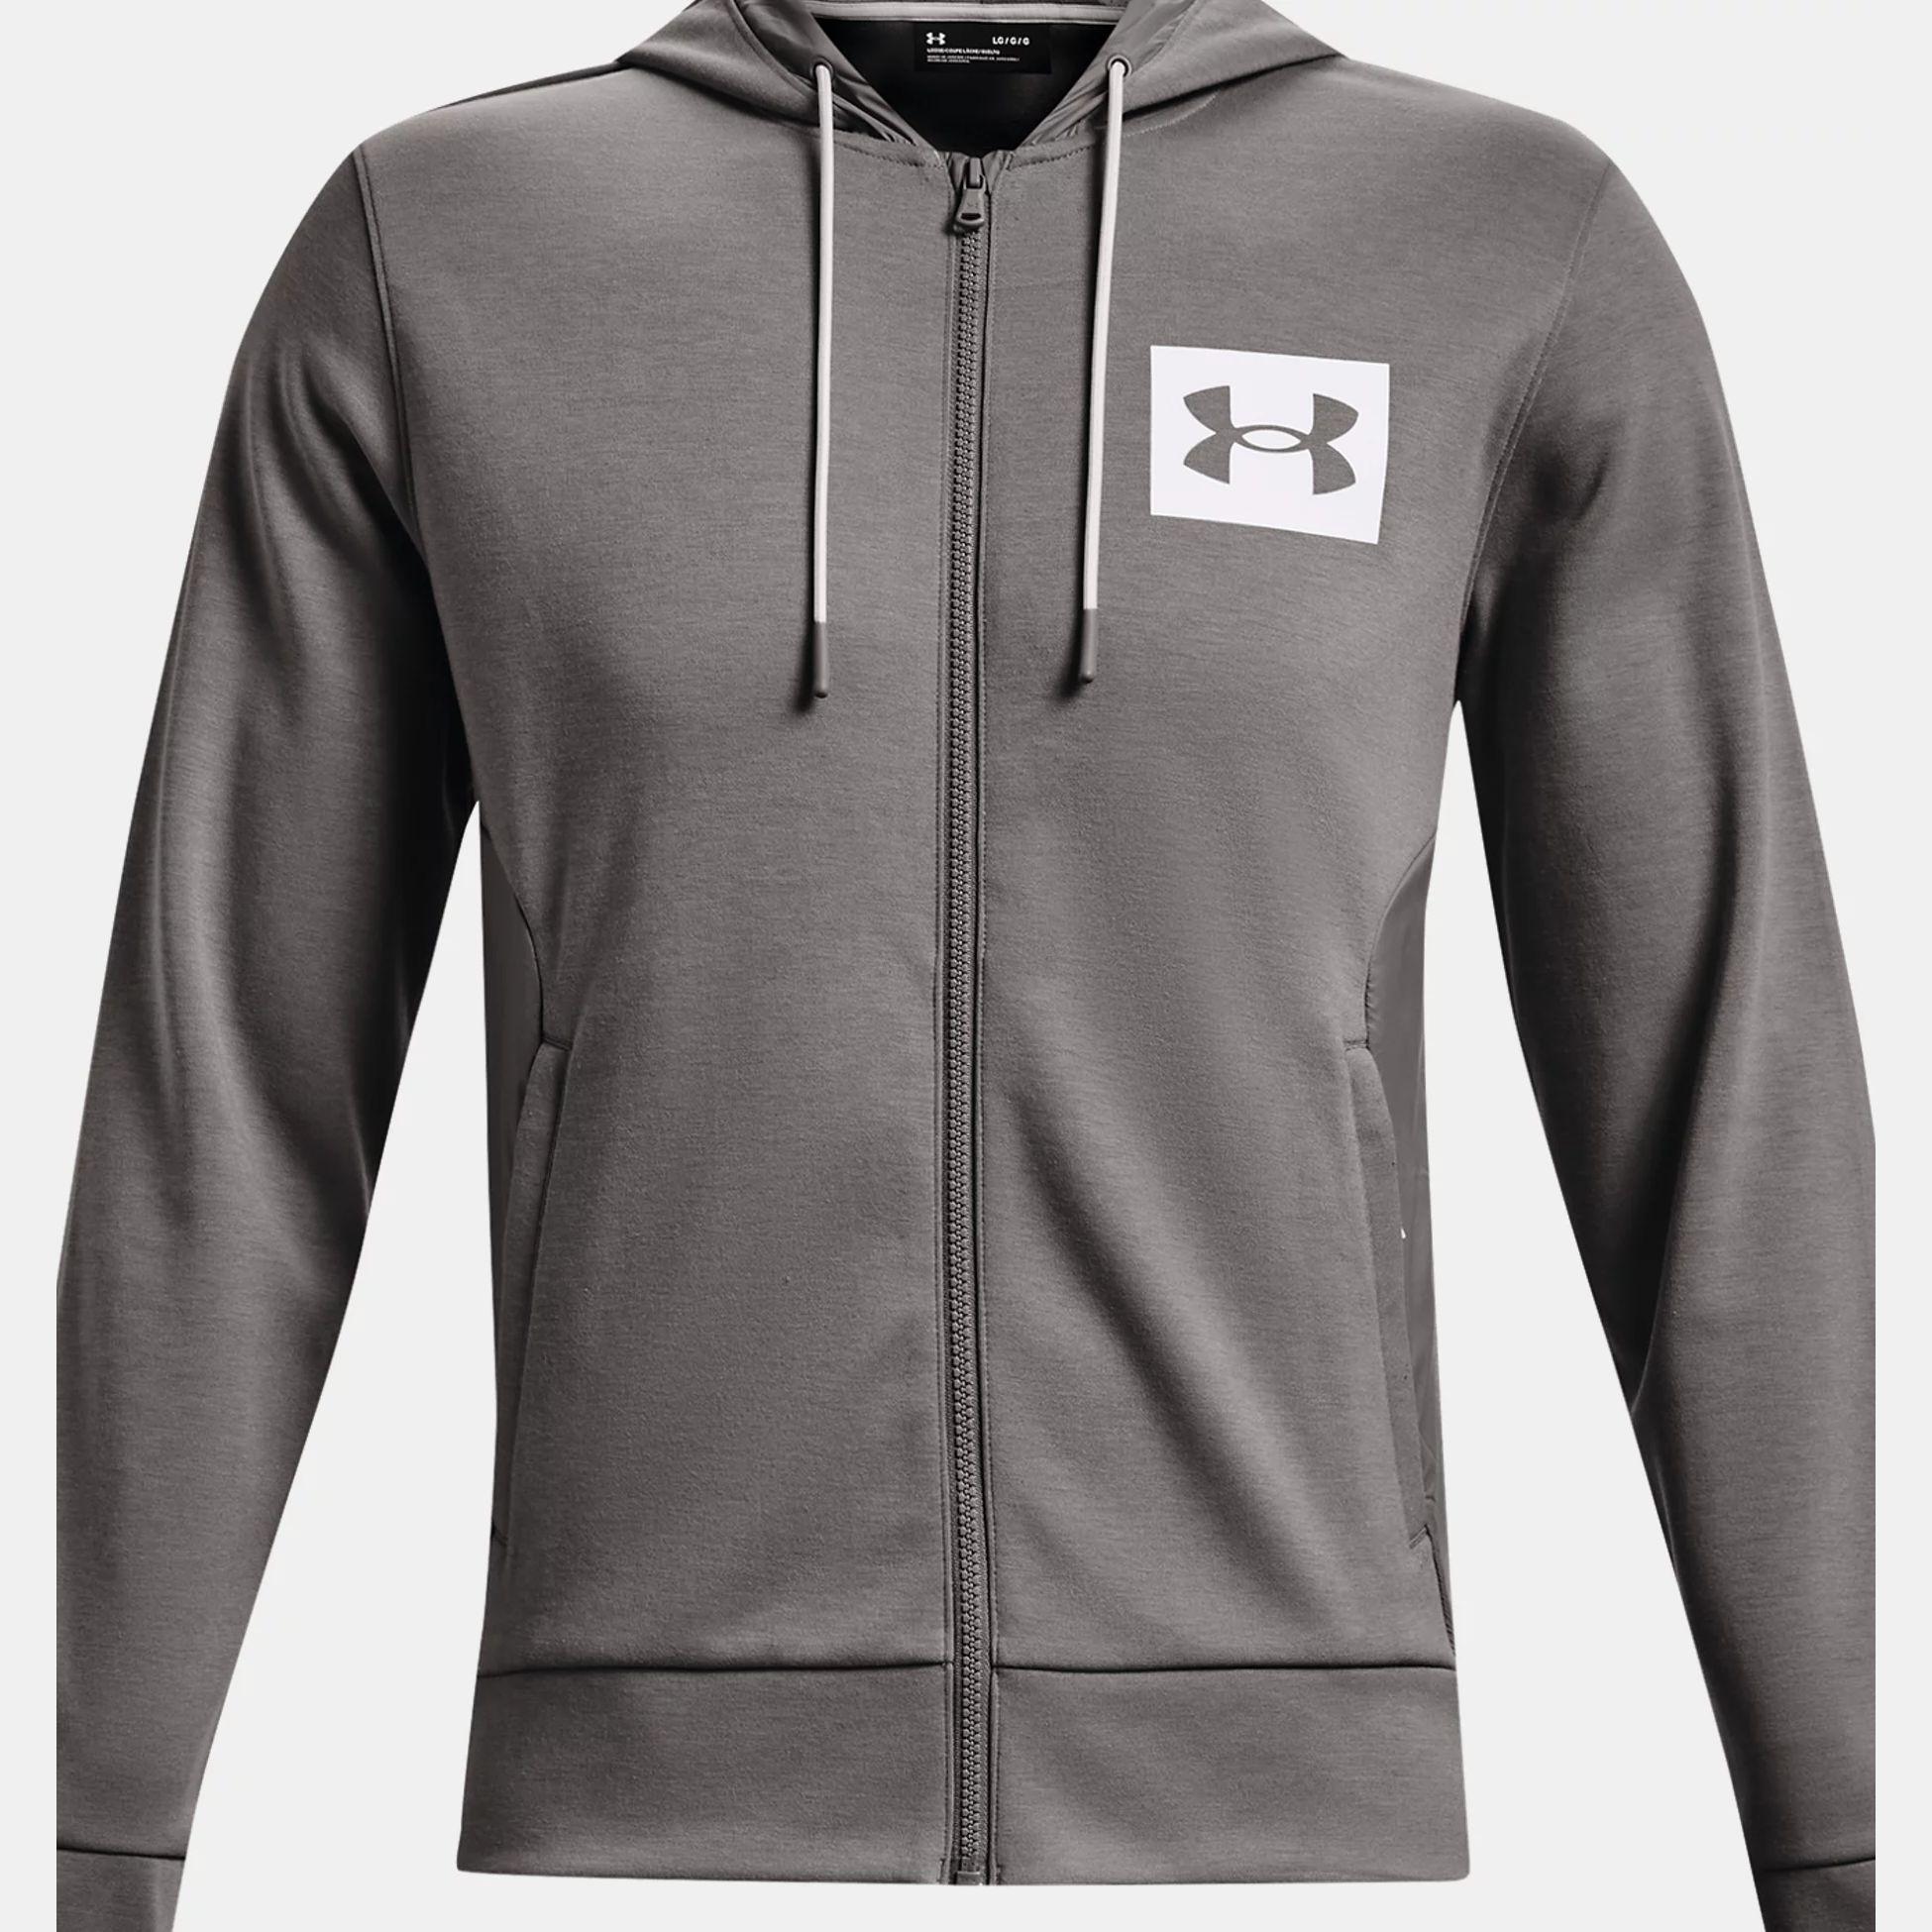 Clothing -  under armour UA Summit Knit Full-Zip Hoodie